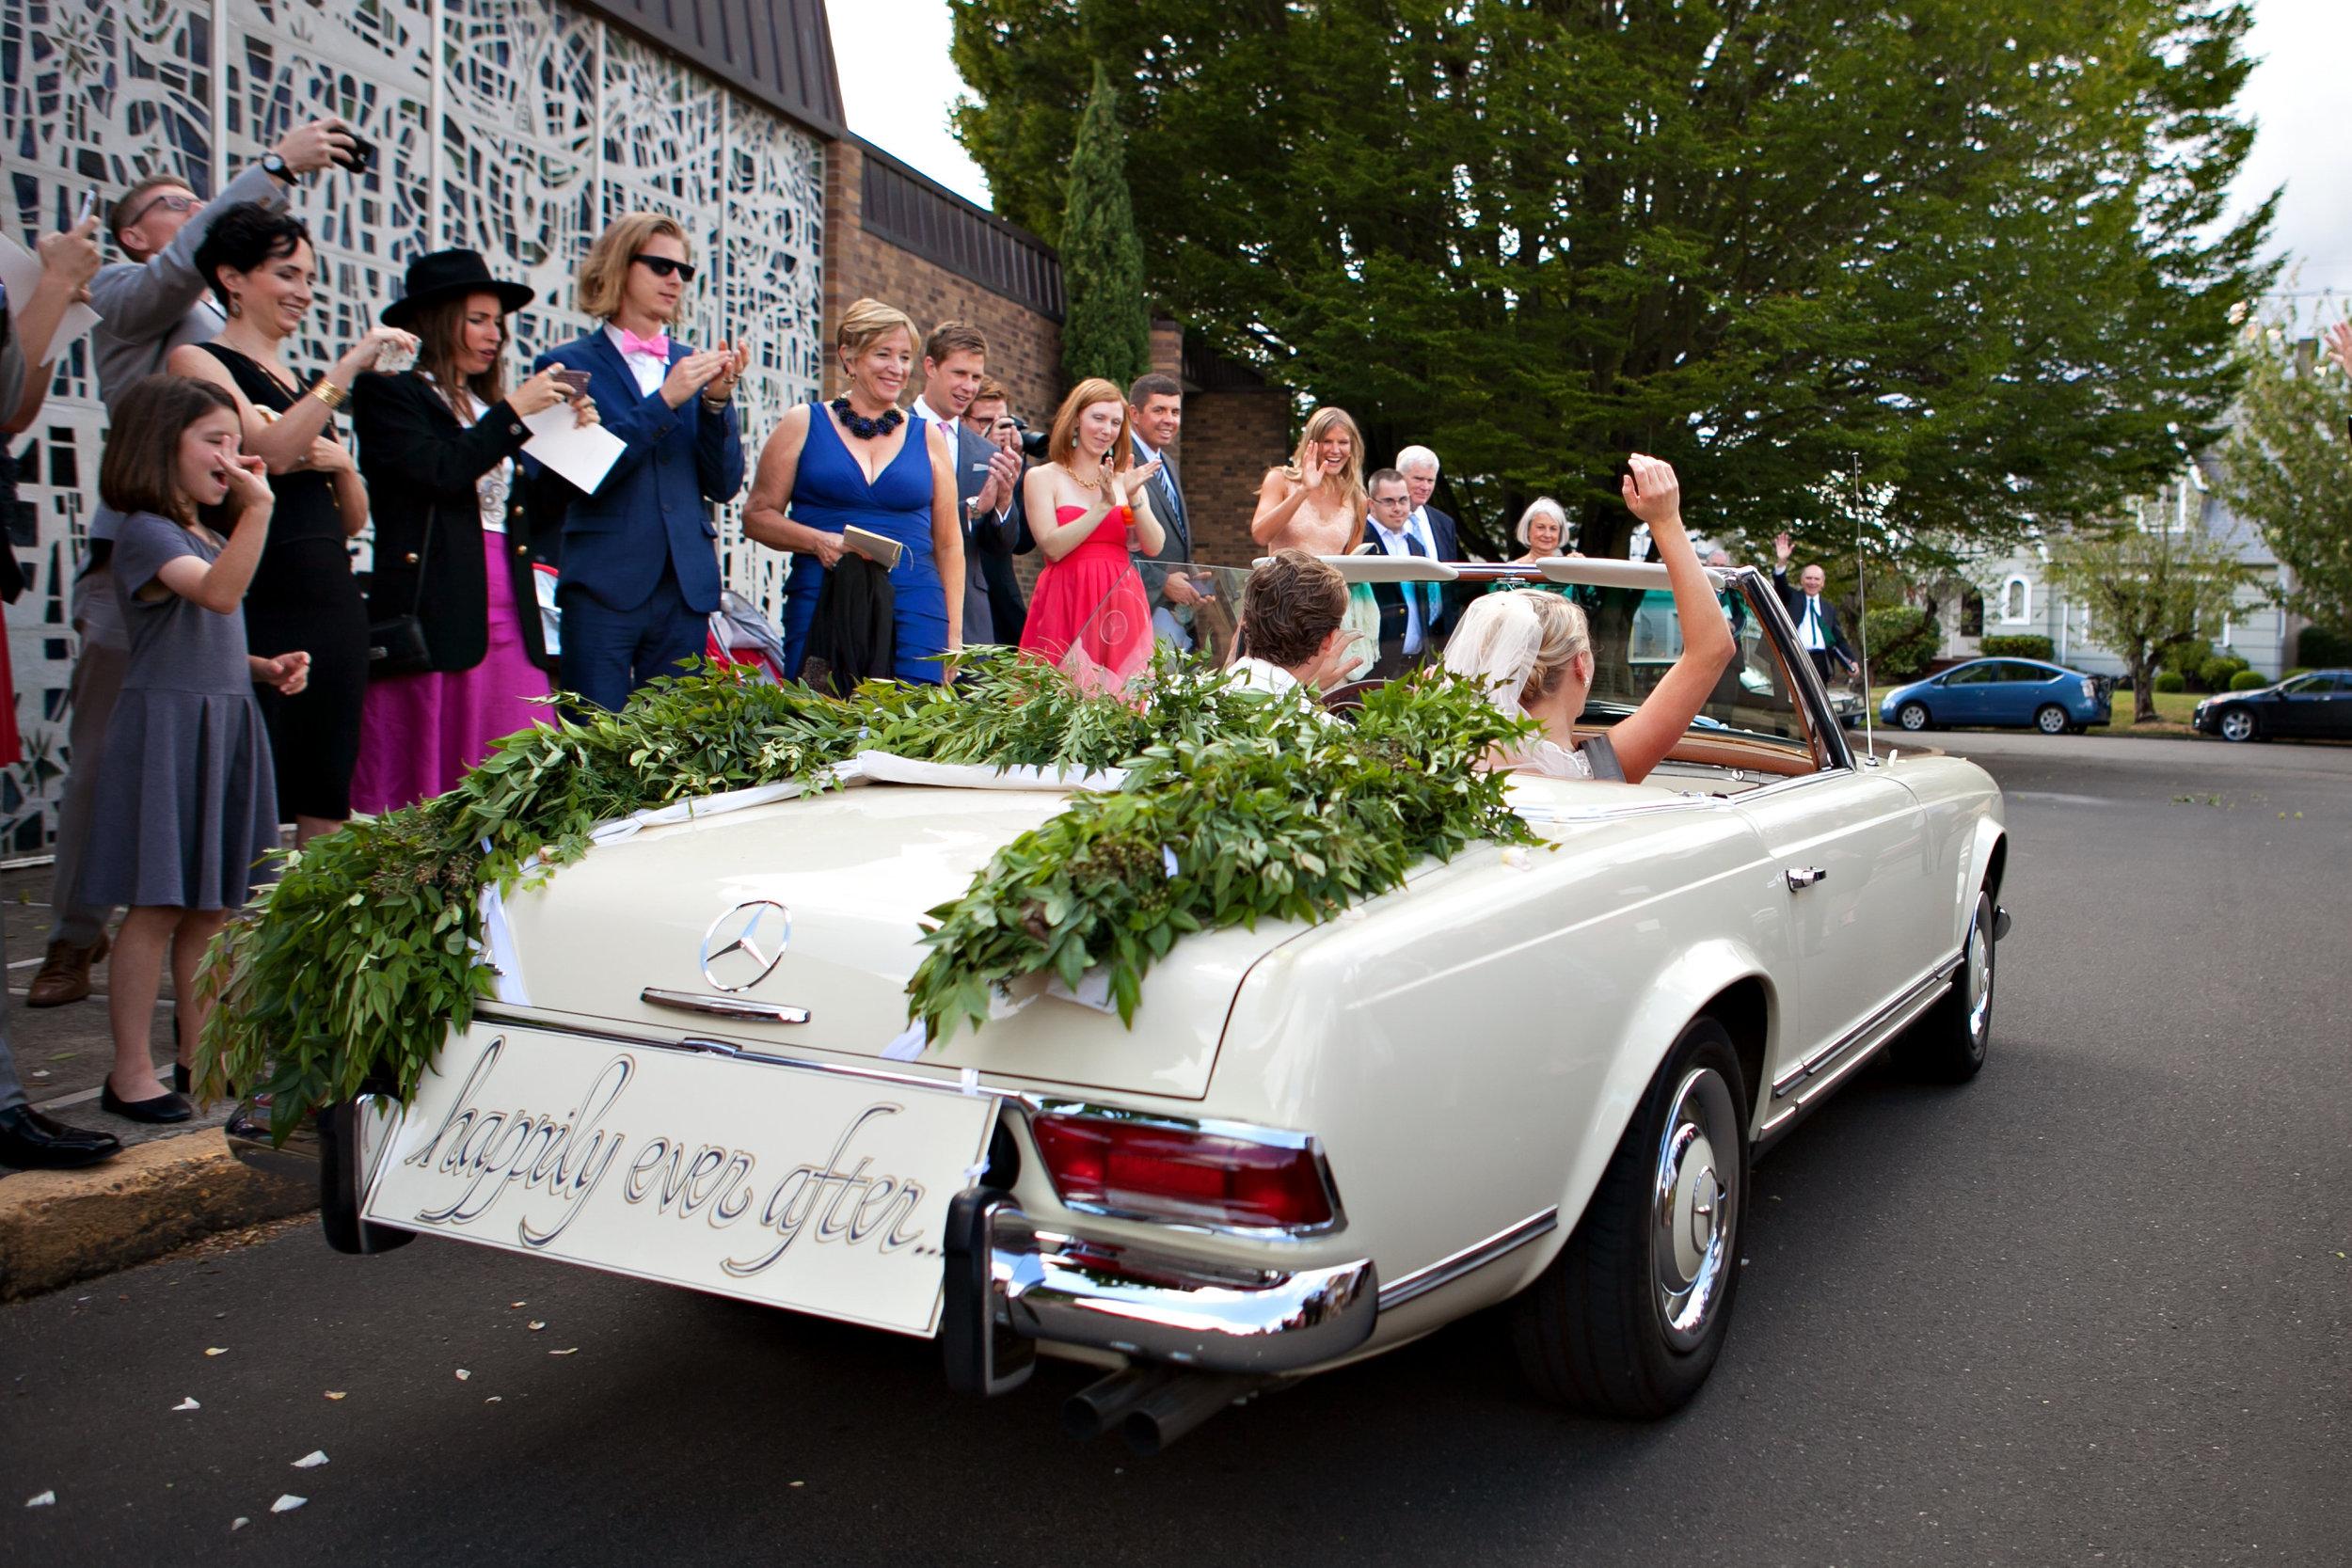 Bridalbliss.com | Portland Wedding | Oregon Event Planning and Design | Bethany F Photography